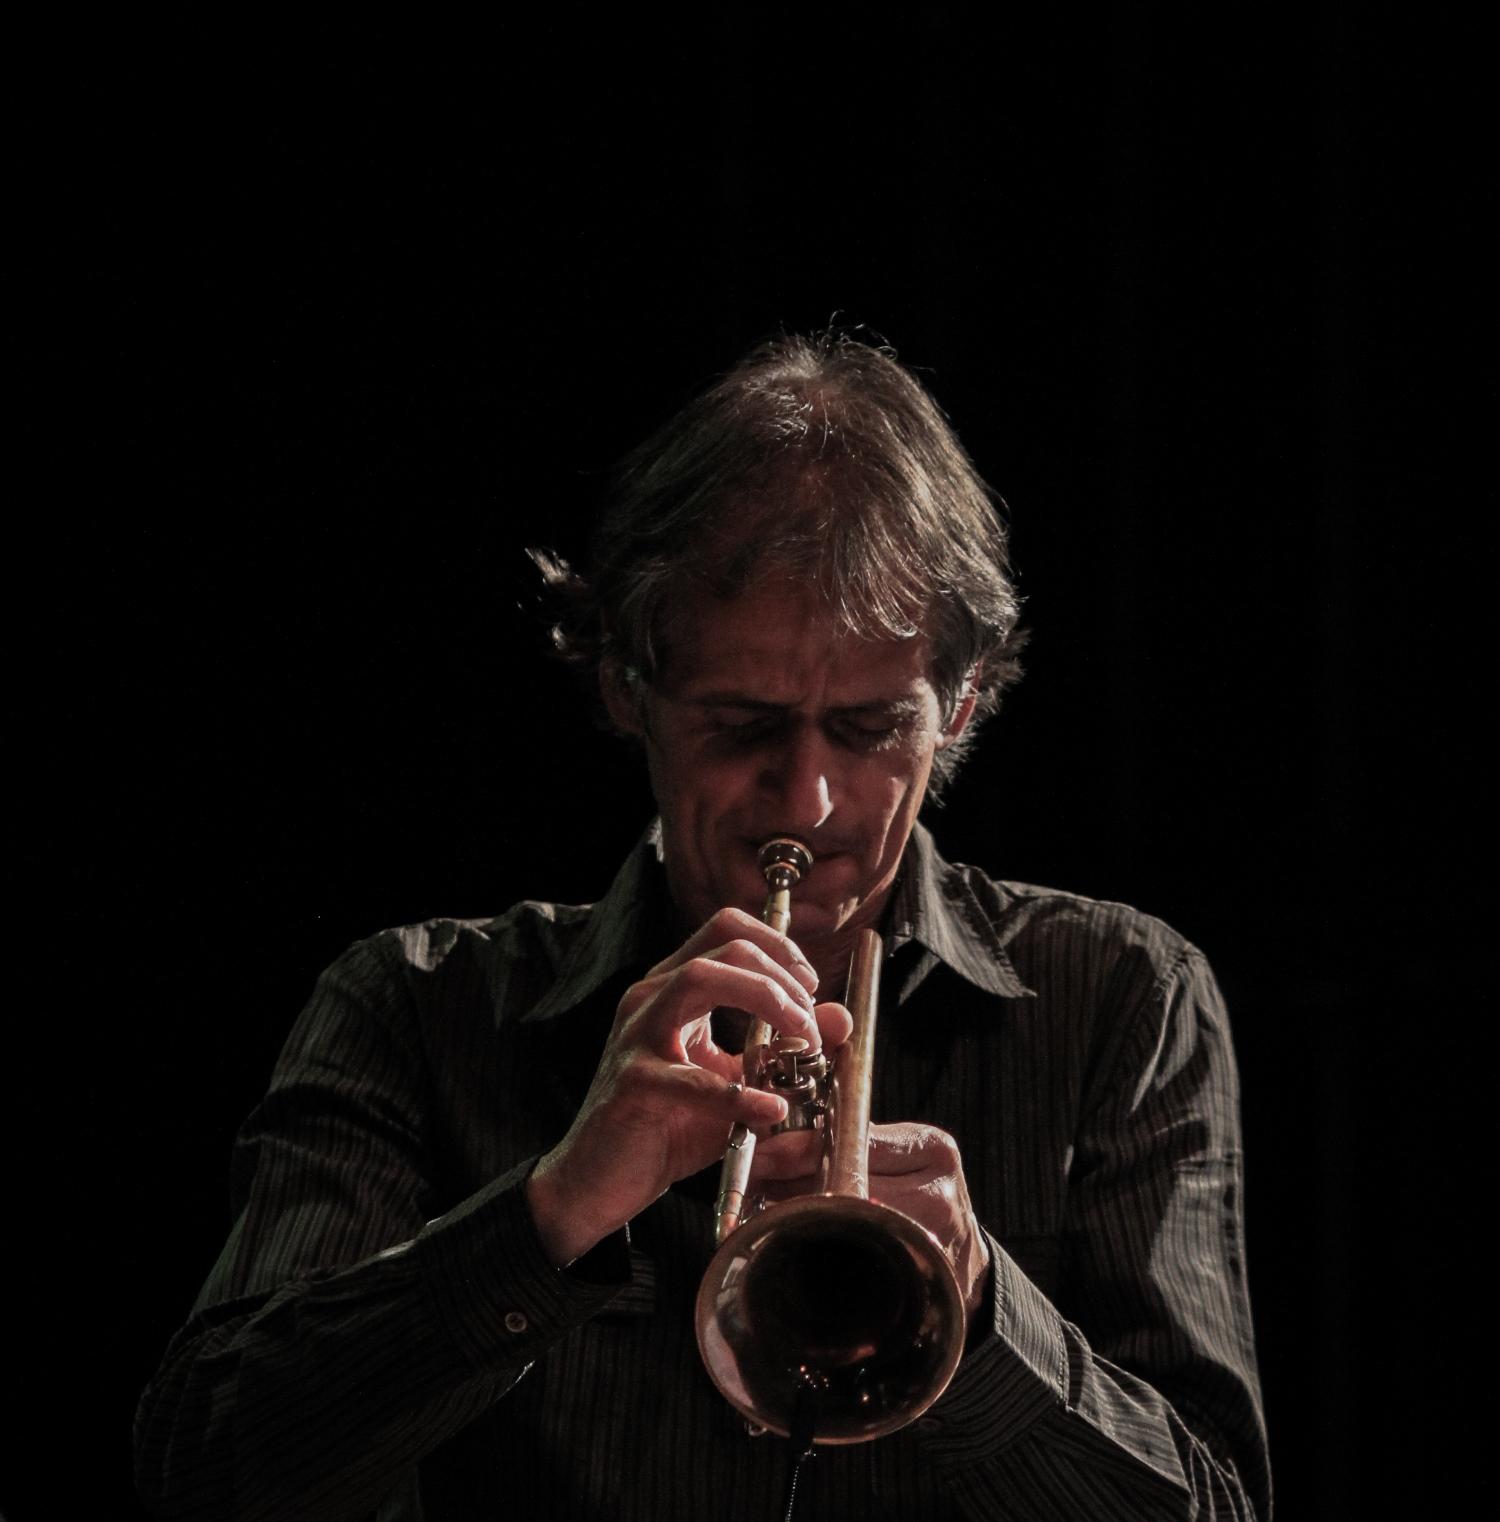 Markus stockhausen, valby summer jazz 2013, copenhagen